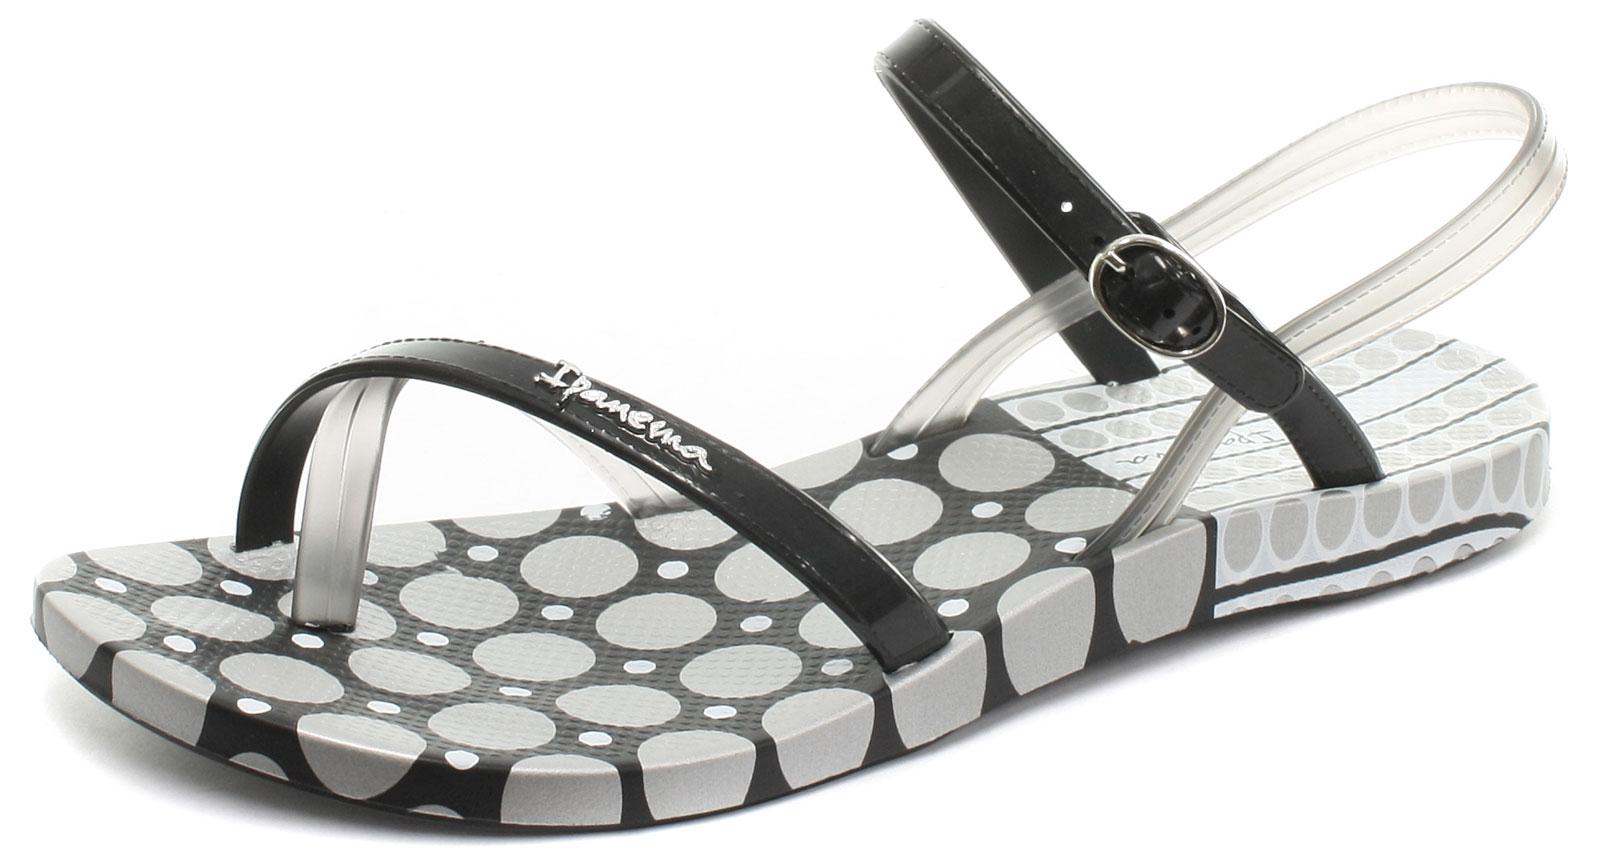 Ipanema Brasil Diamond IV Navy Womens Beach Sandals Size UK 5 (EU 38) q1pOvk1